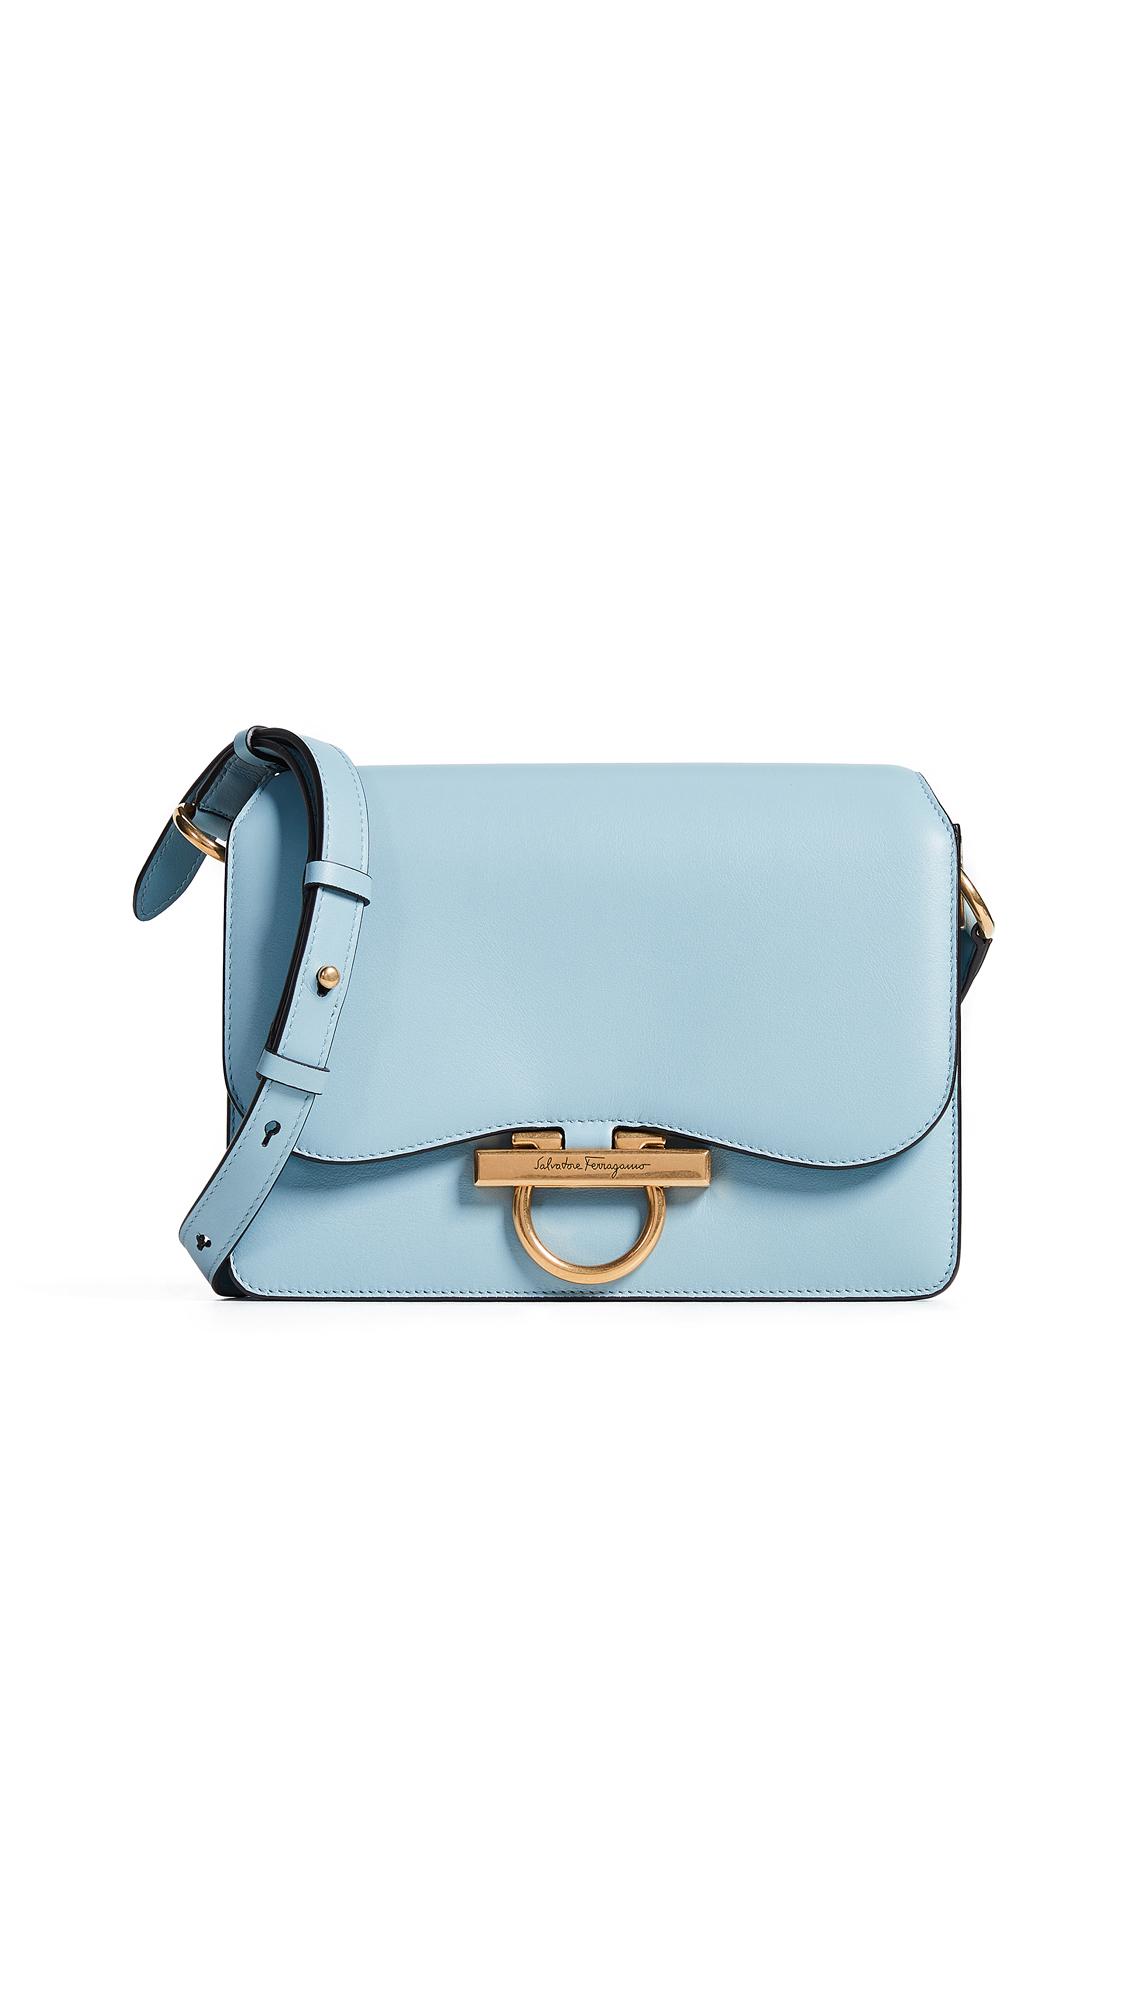 9ca25e53cac9 Salvatore Ferragamo Classic Flap Shoulder Bag In Blue Haze